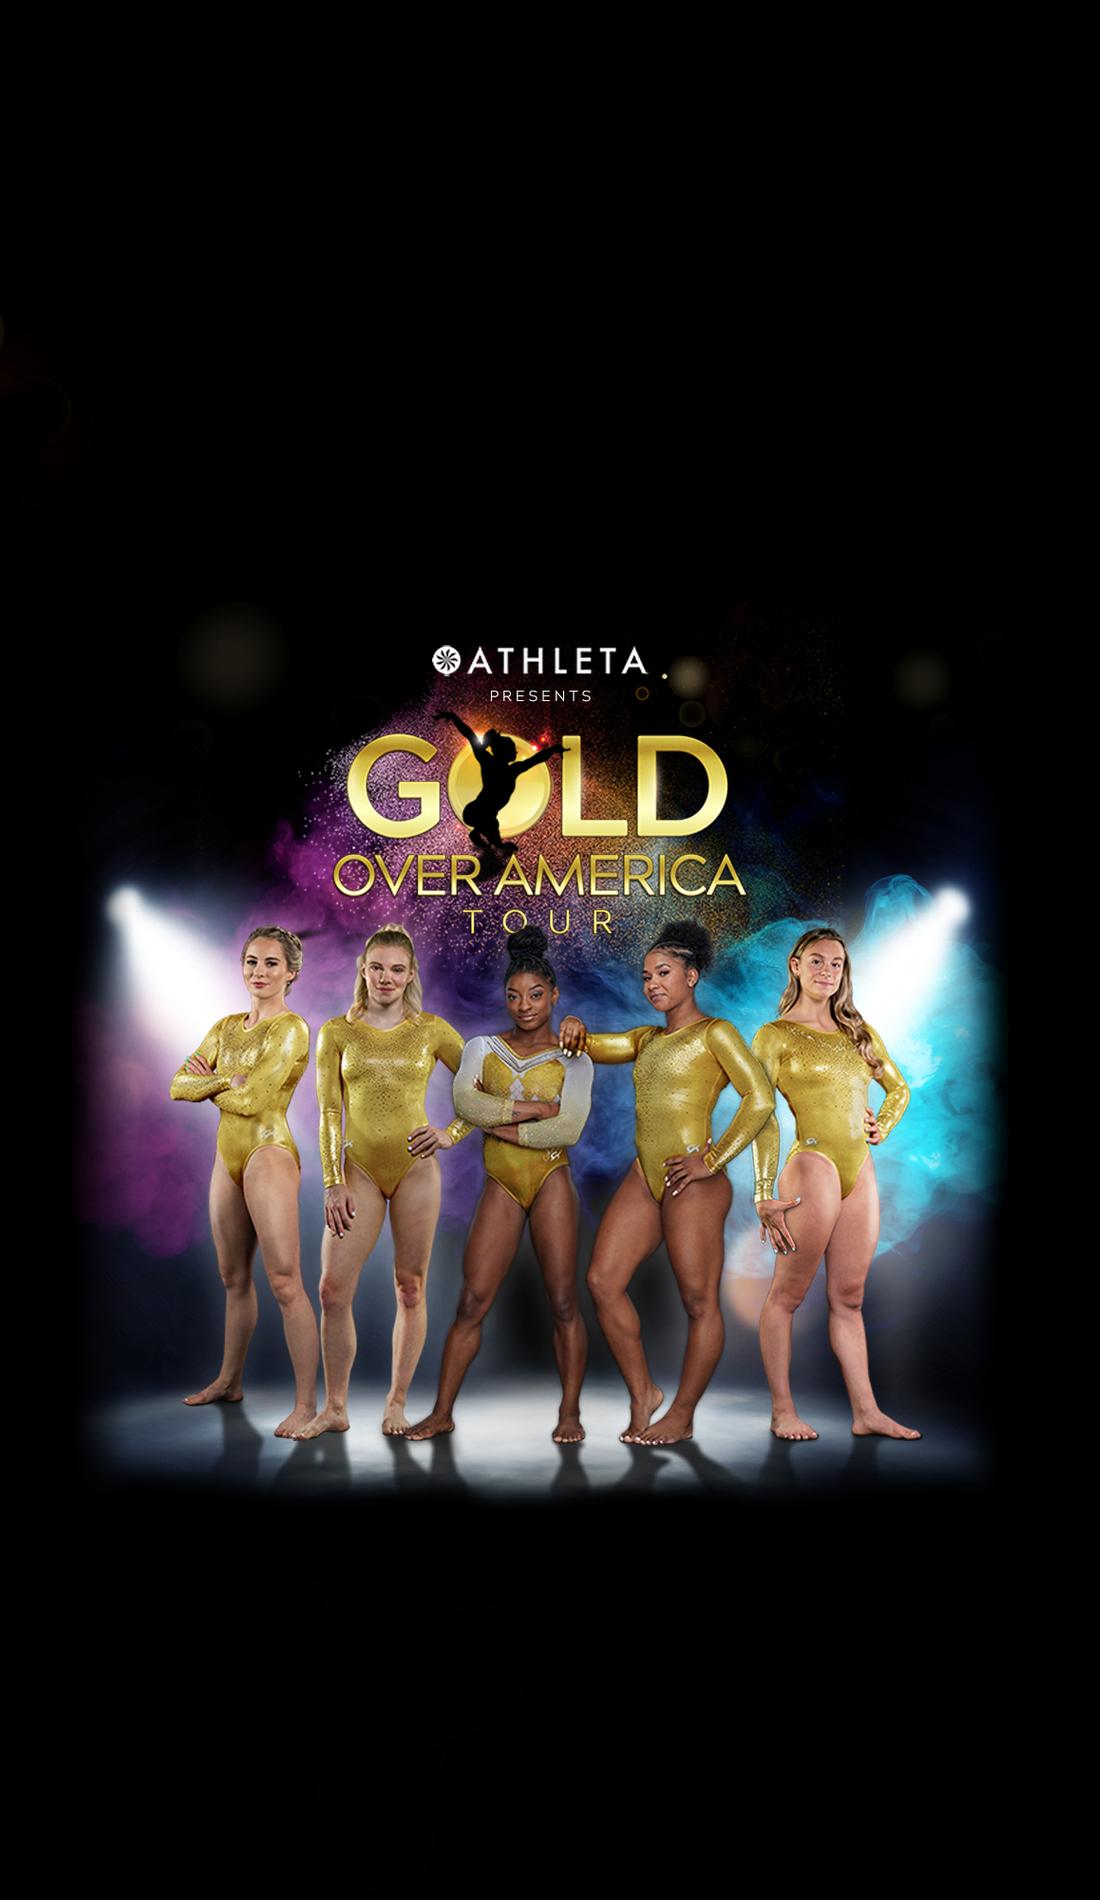 A Gold Over America Tour live event